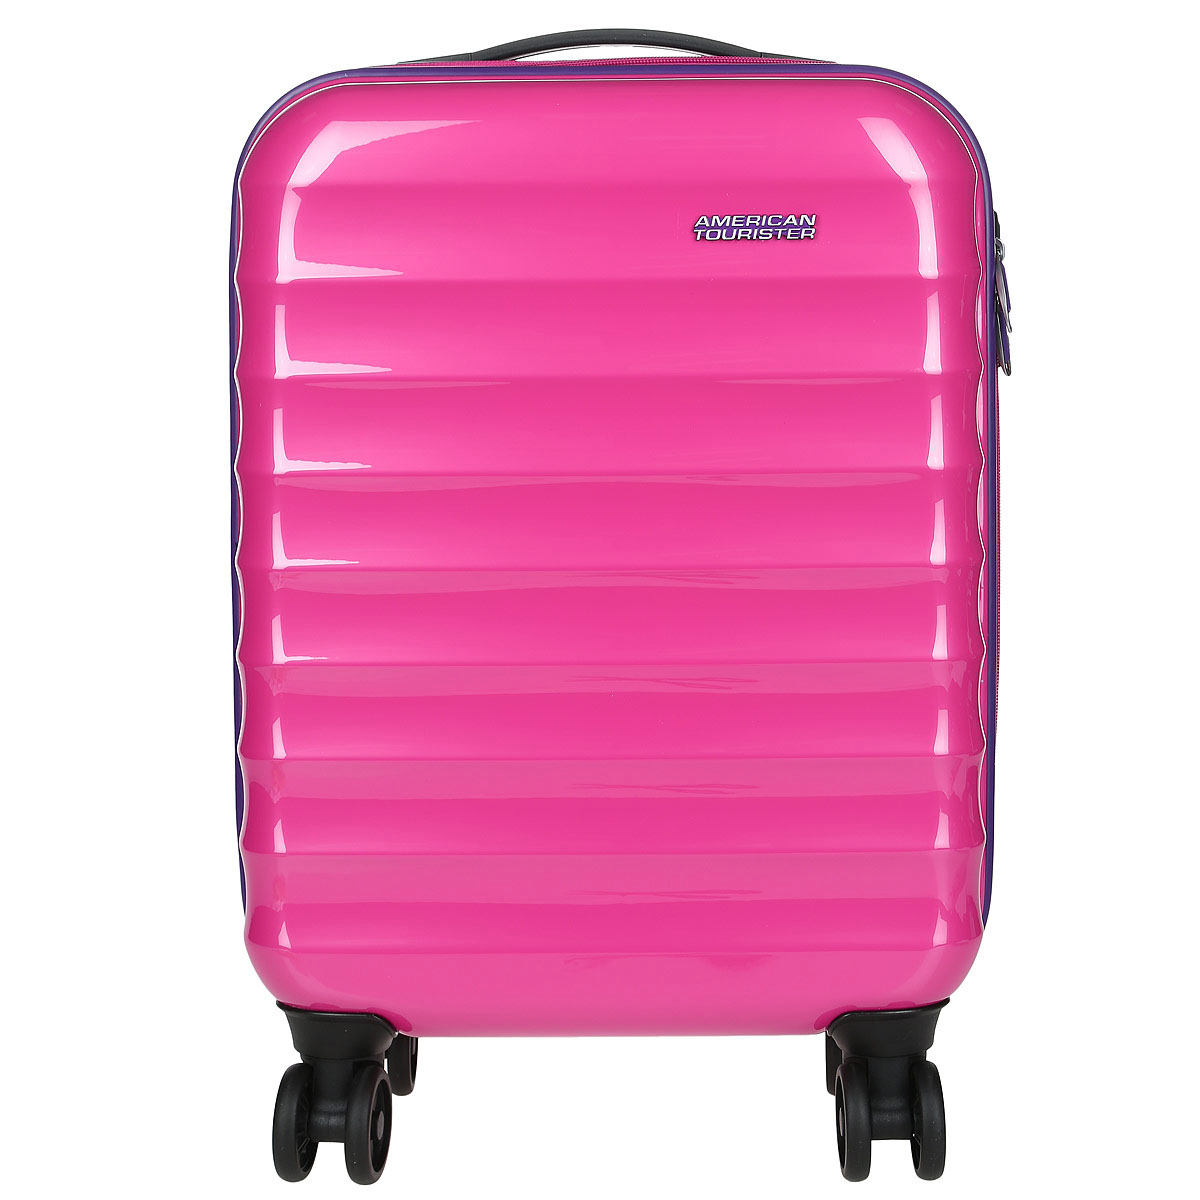 Чемодан American Tourister Palm Valley, цвет: розовый, 32 л чемодан american tourister pasadena spinner 55 см белый